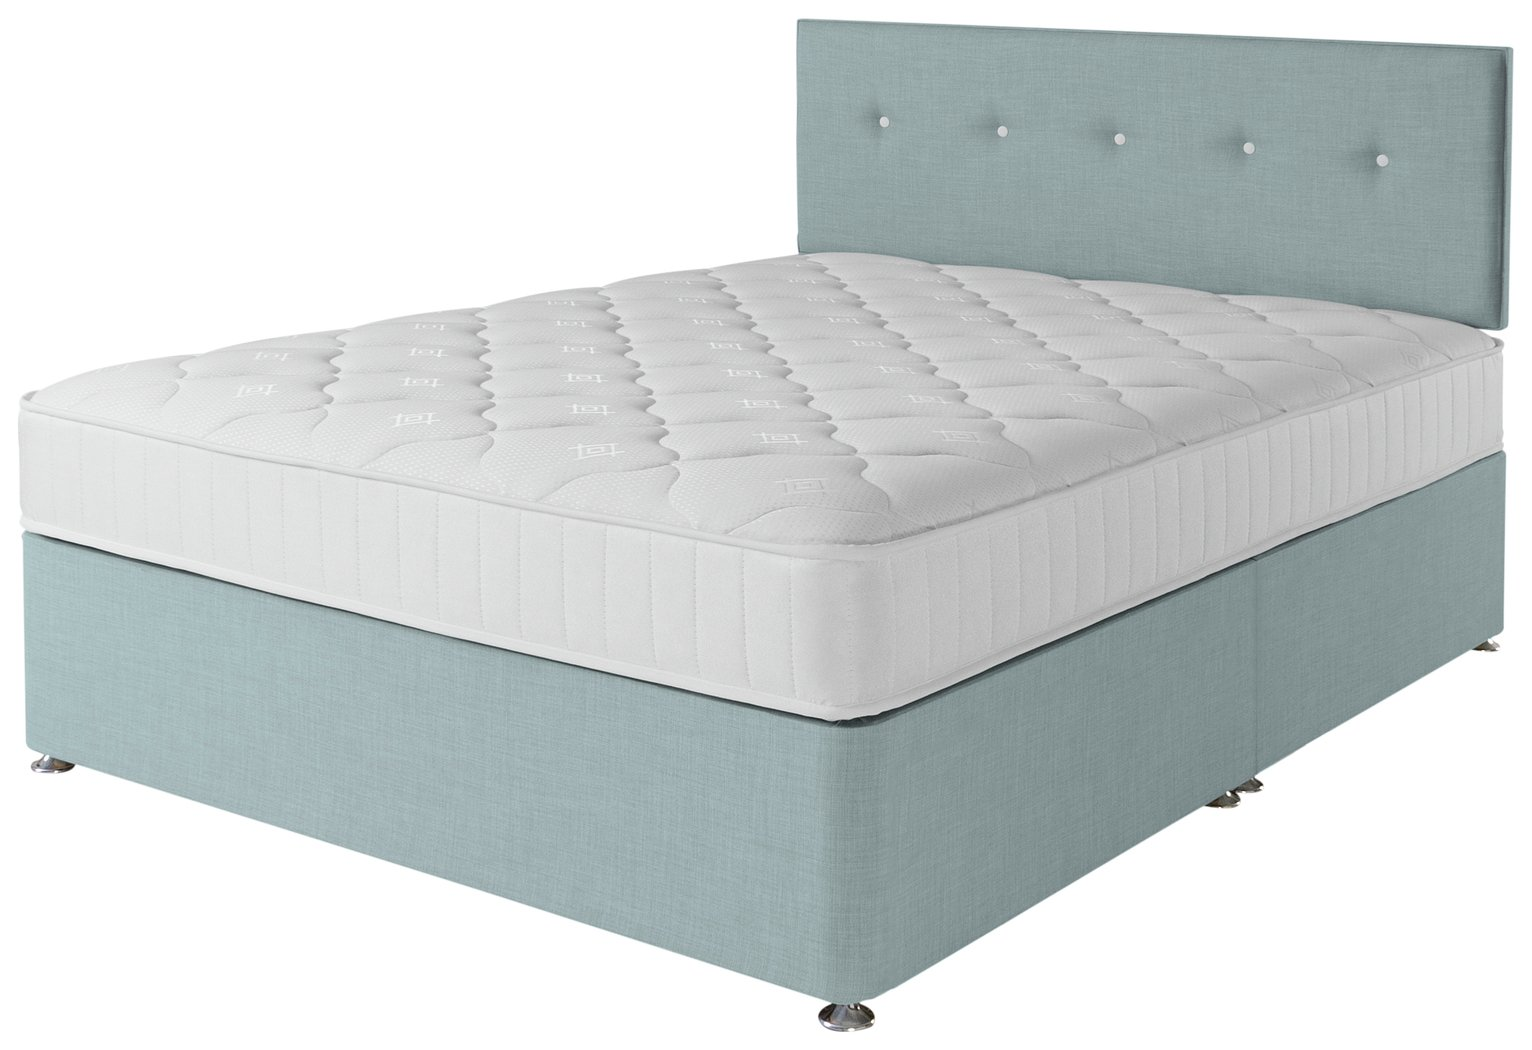 Airsprung Dalham 800 Pocket Memory Blue Divan Bed - Kingsize